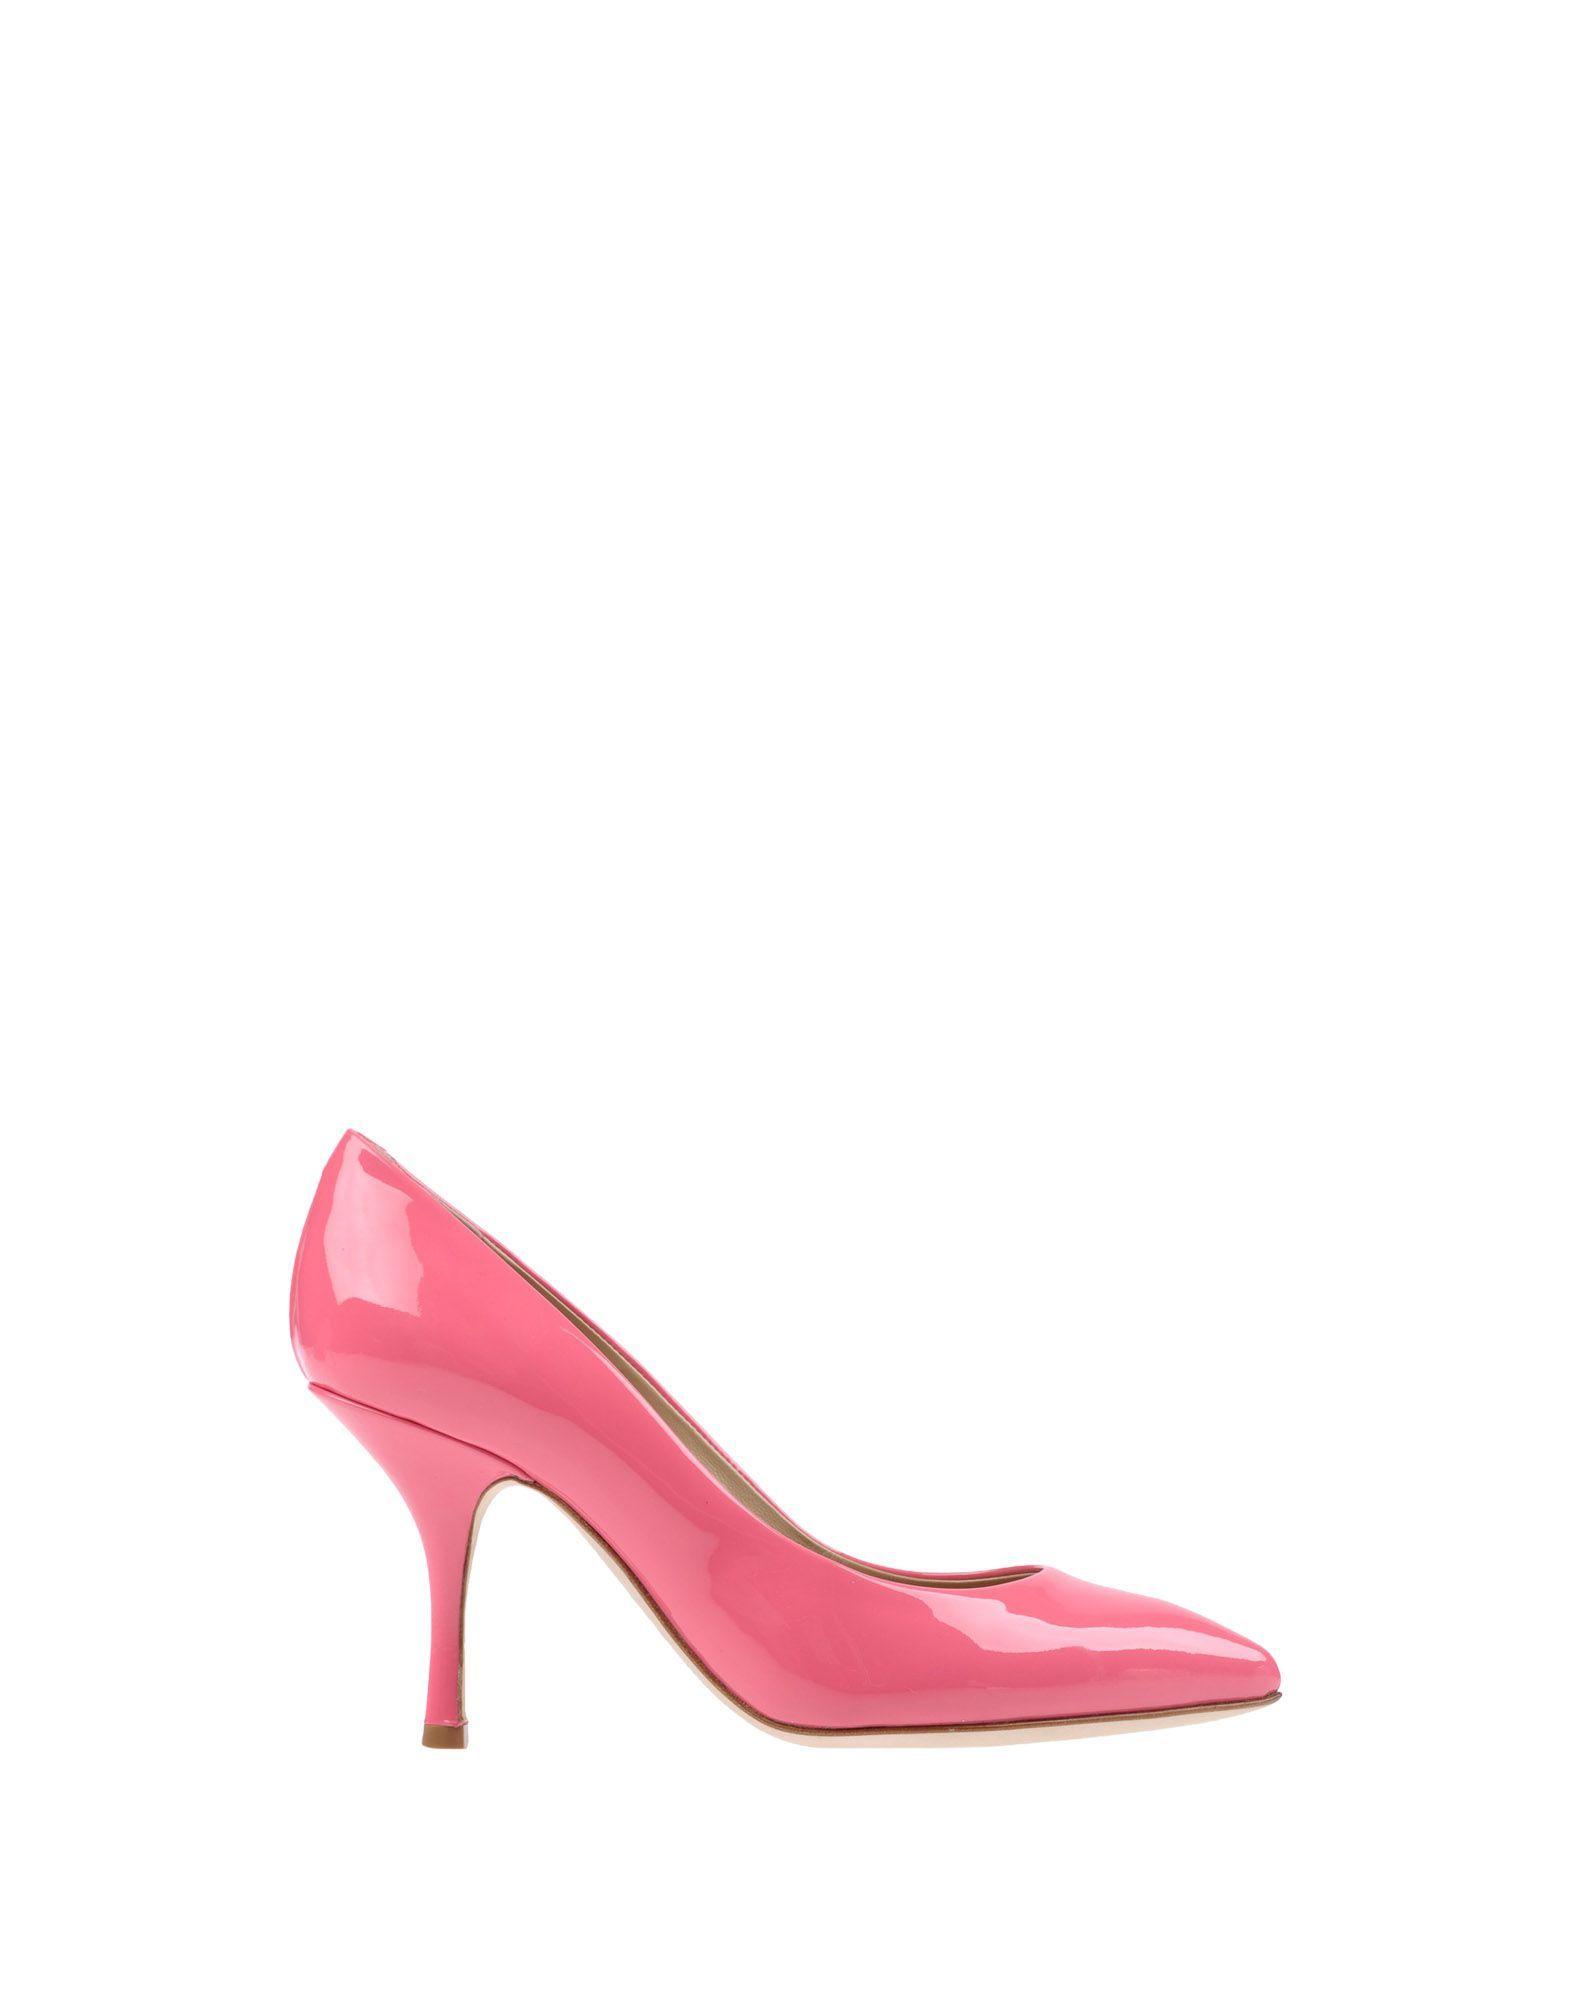 Giuseppe Zanotti Fuchsia Leather Heels